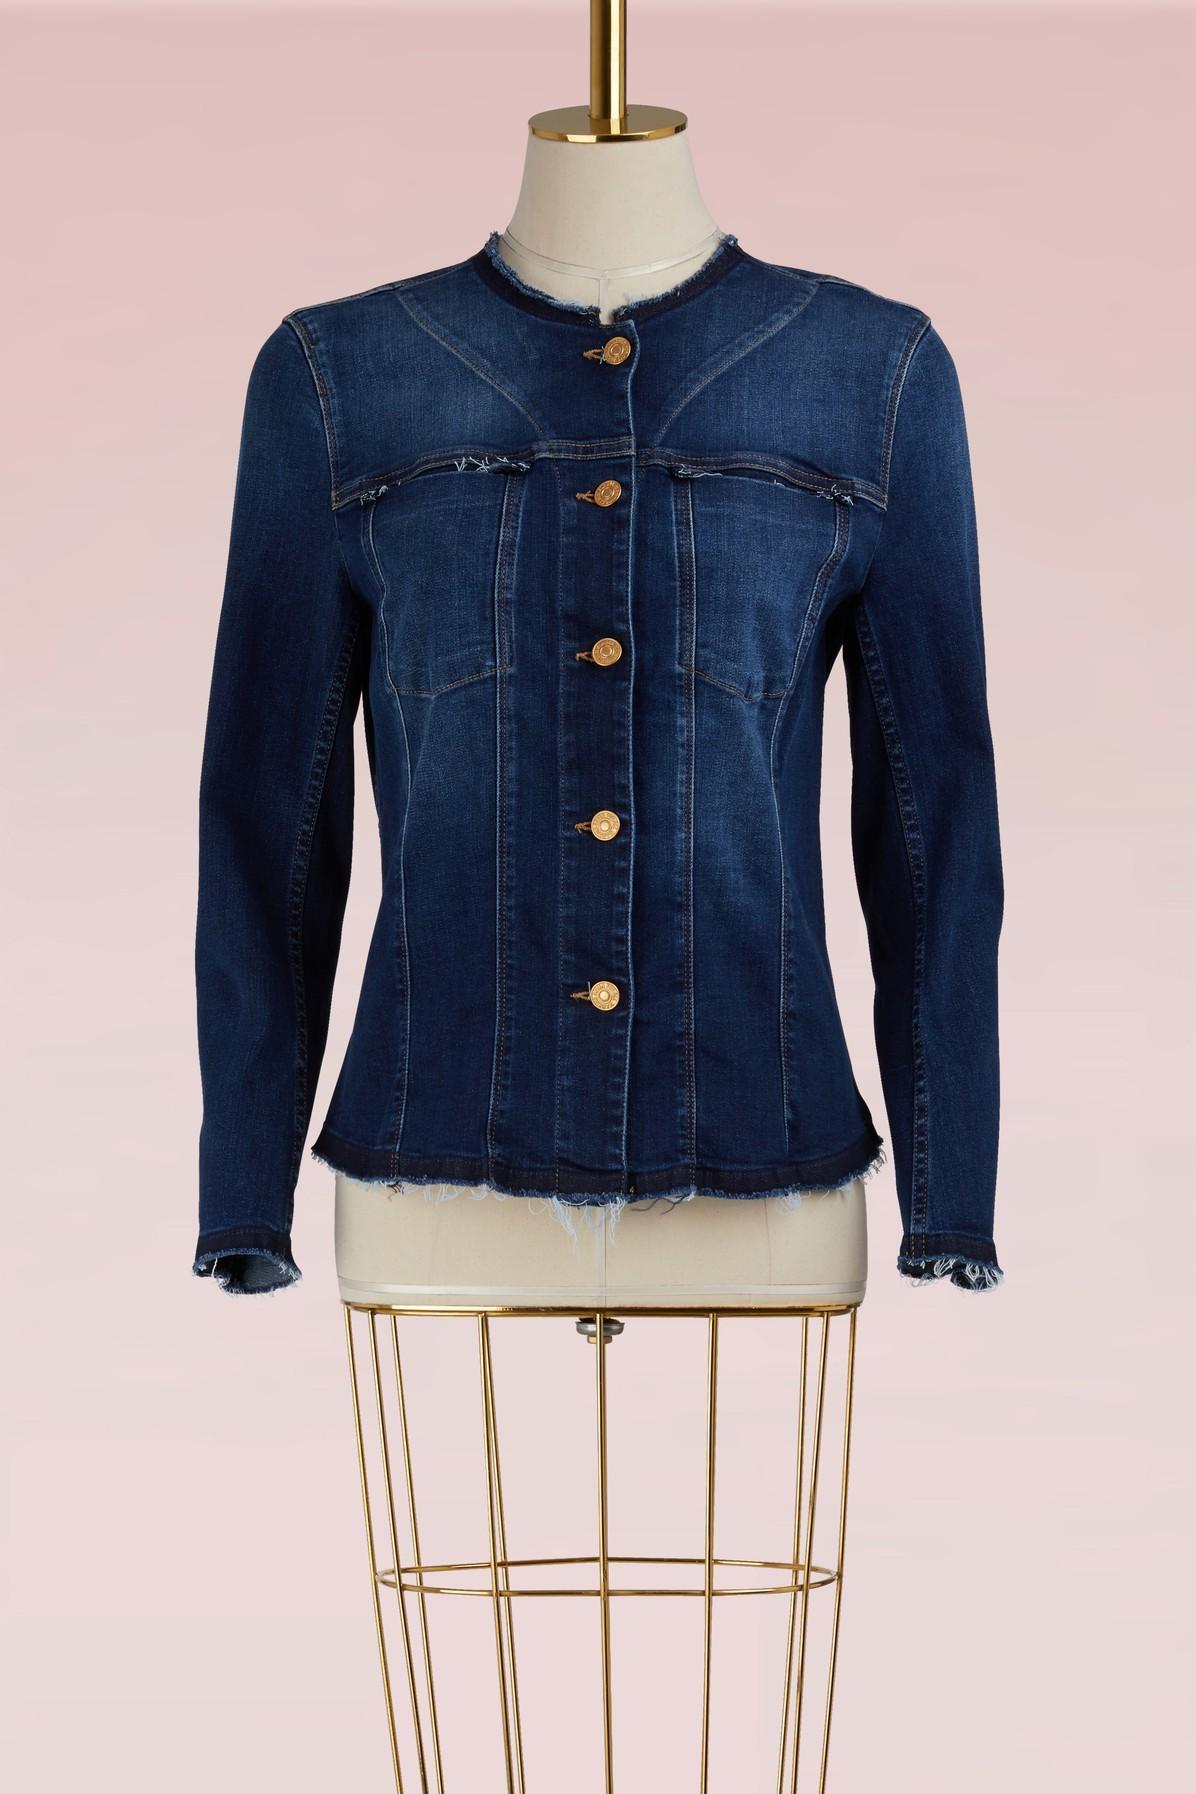 7 For All Mankind No Collar Denim Jacket In Duchess